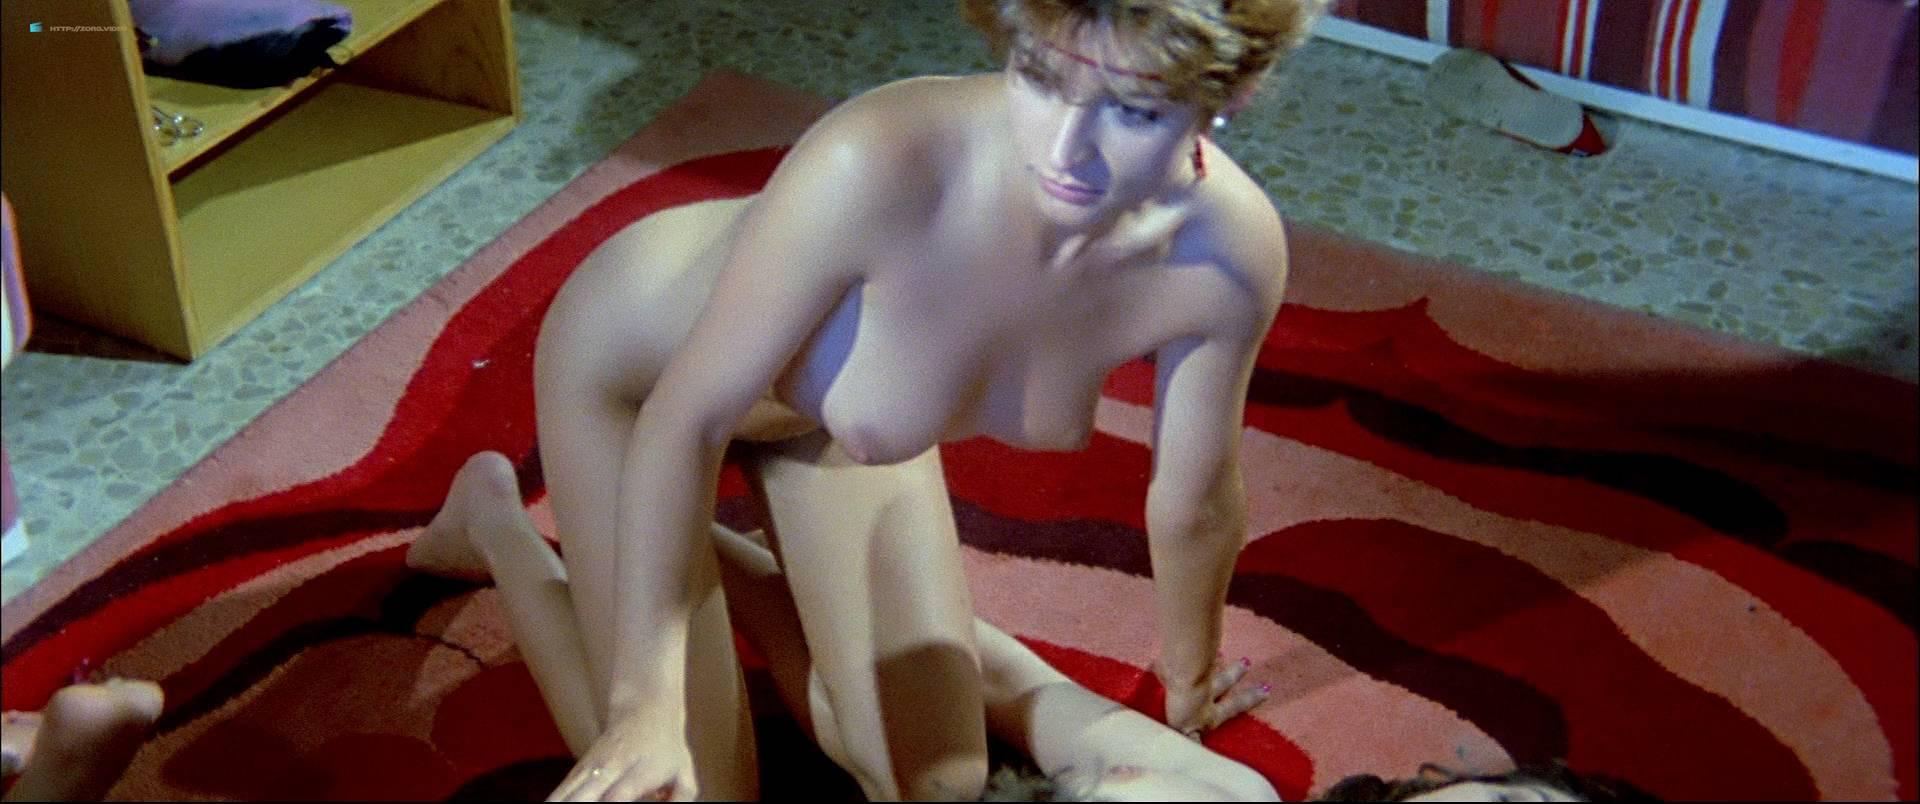 Lina Romay nude full frontal Mari Carmen Nieto, Alicia Príncipe nude too - Night of 1,000 Sexes (SP-1984) HD 1080p BluRay (13)